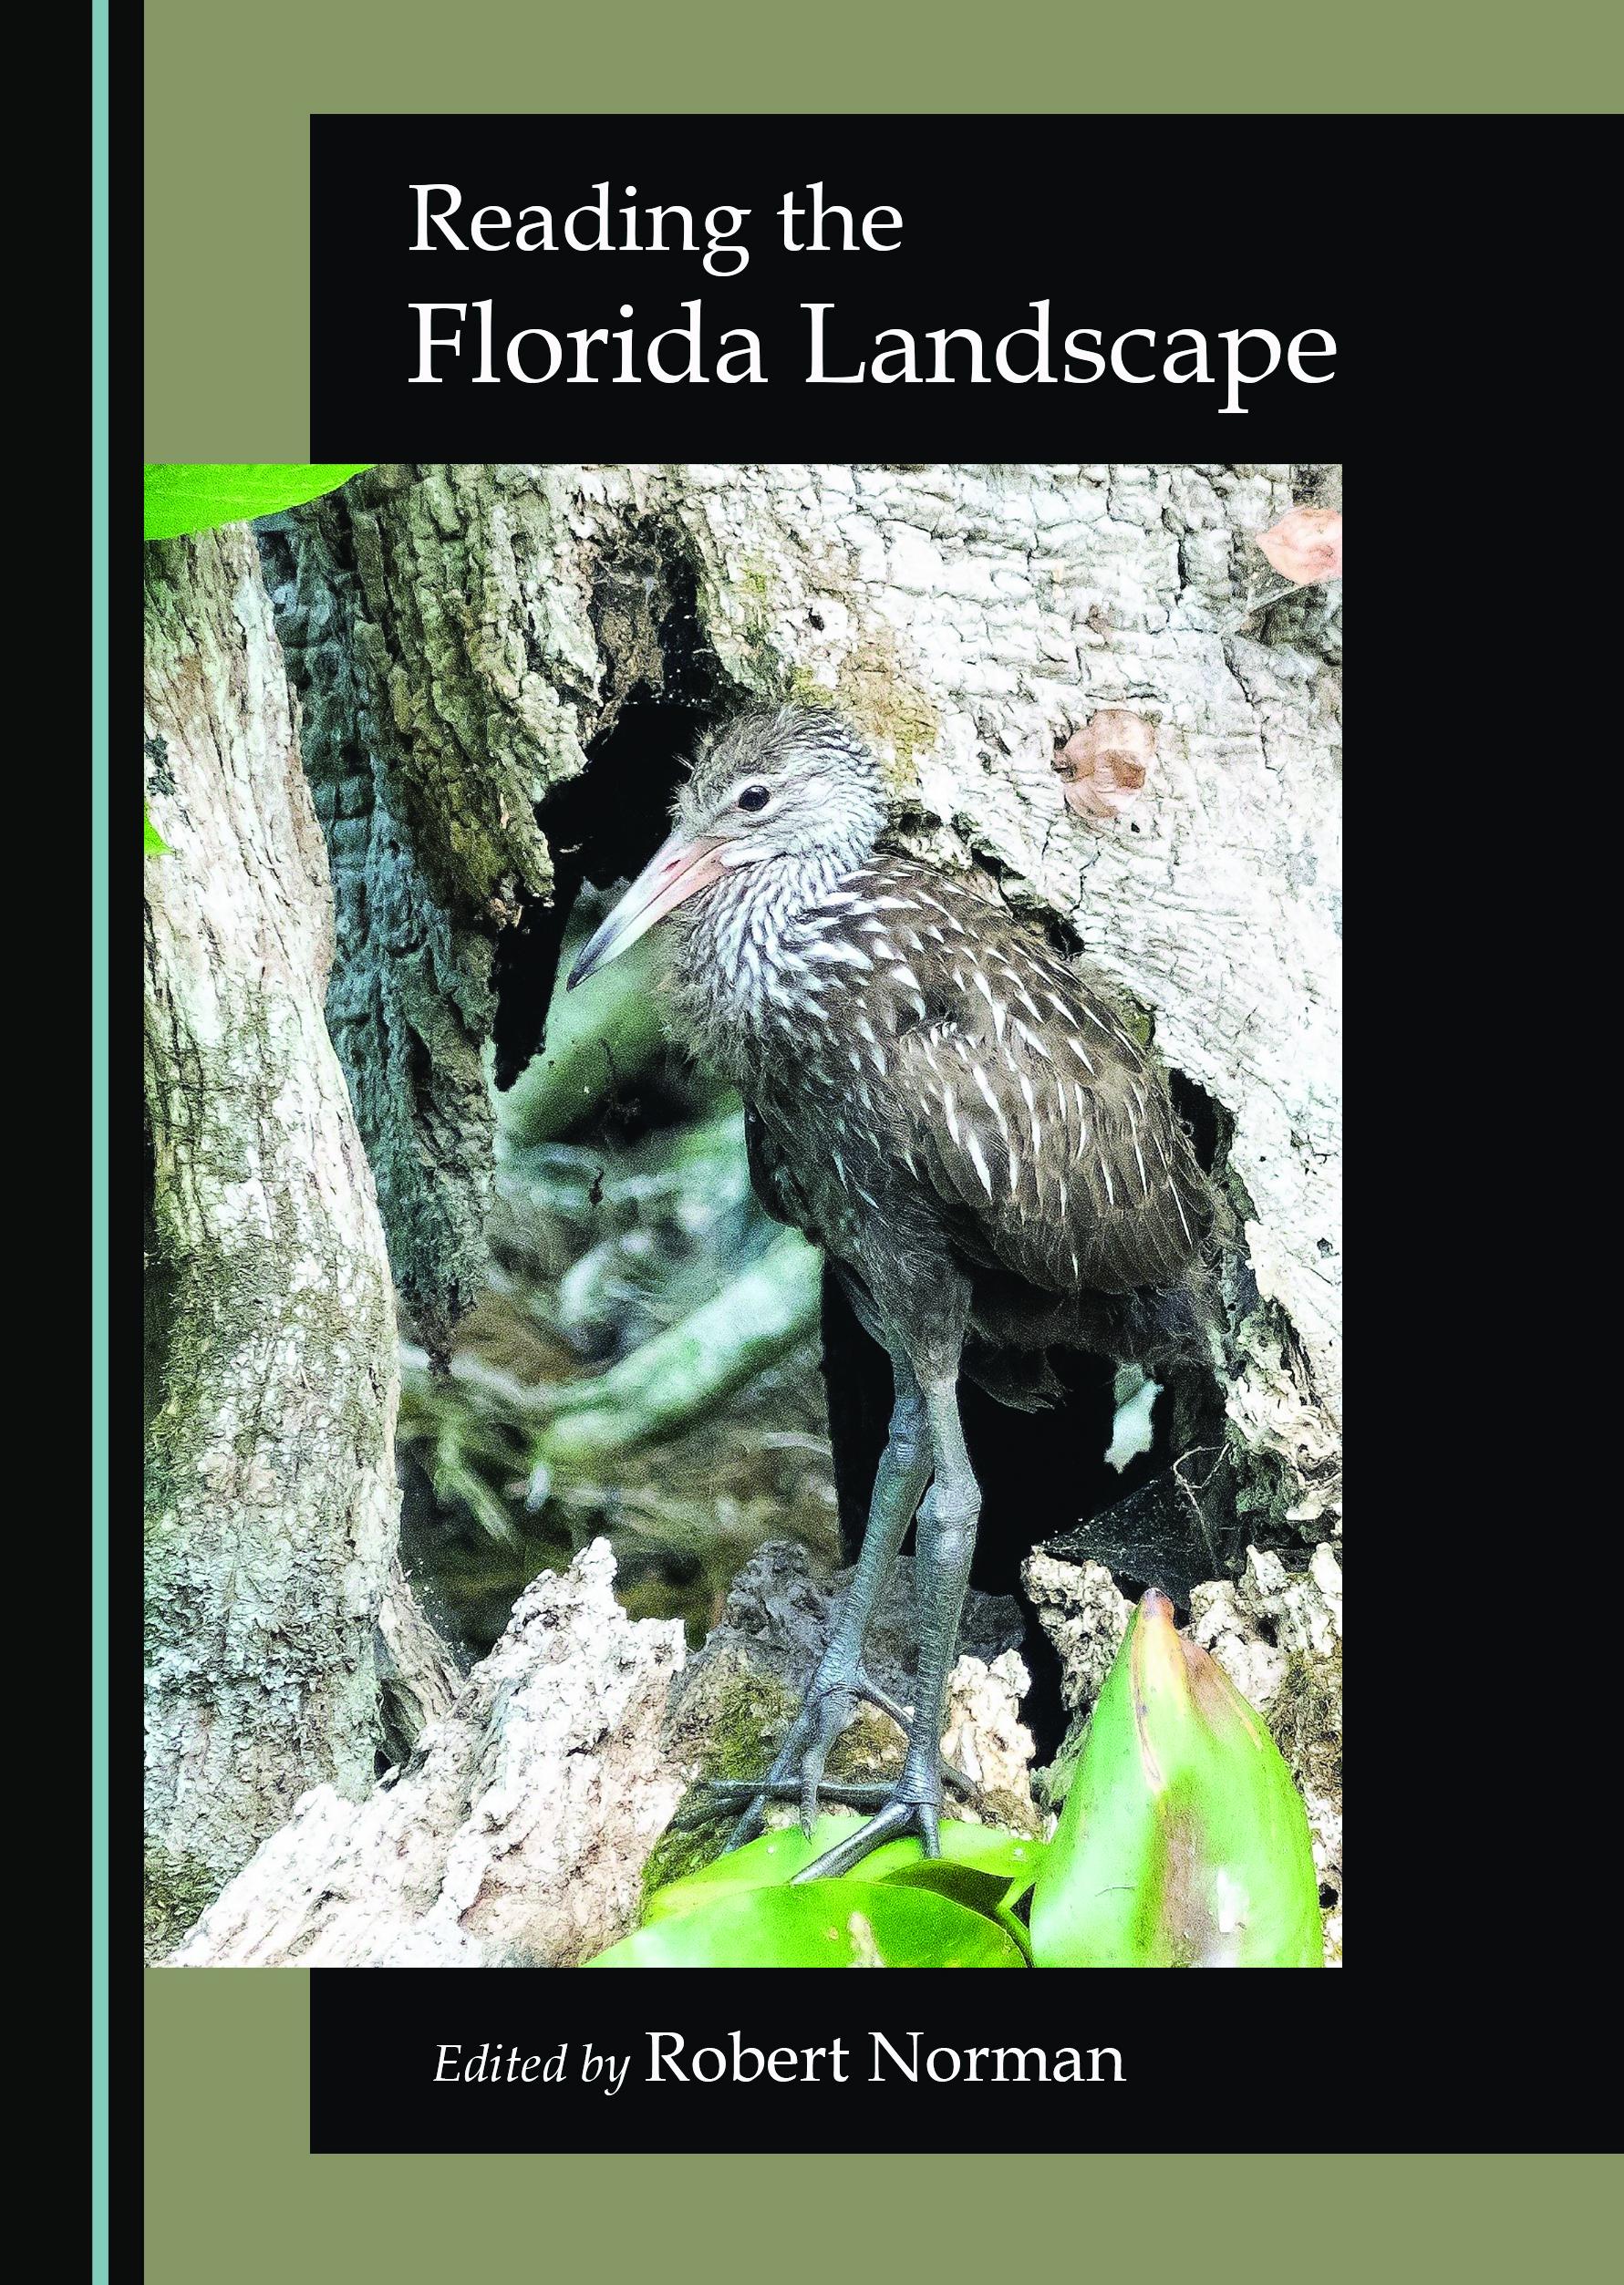 Reading the Florida Landscape